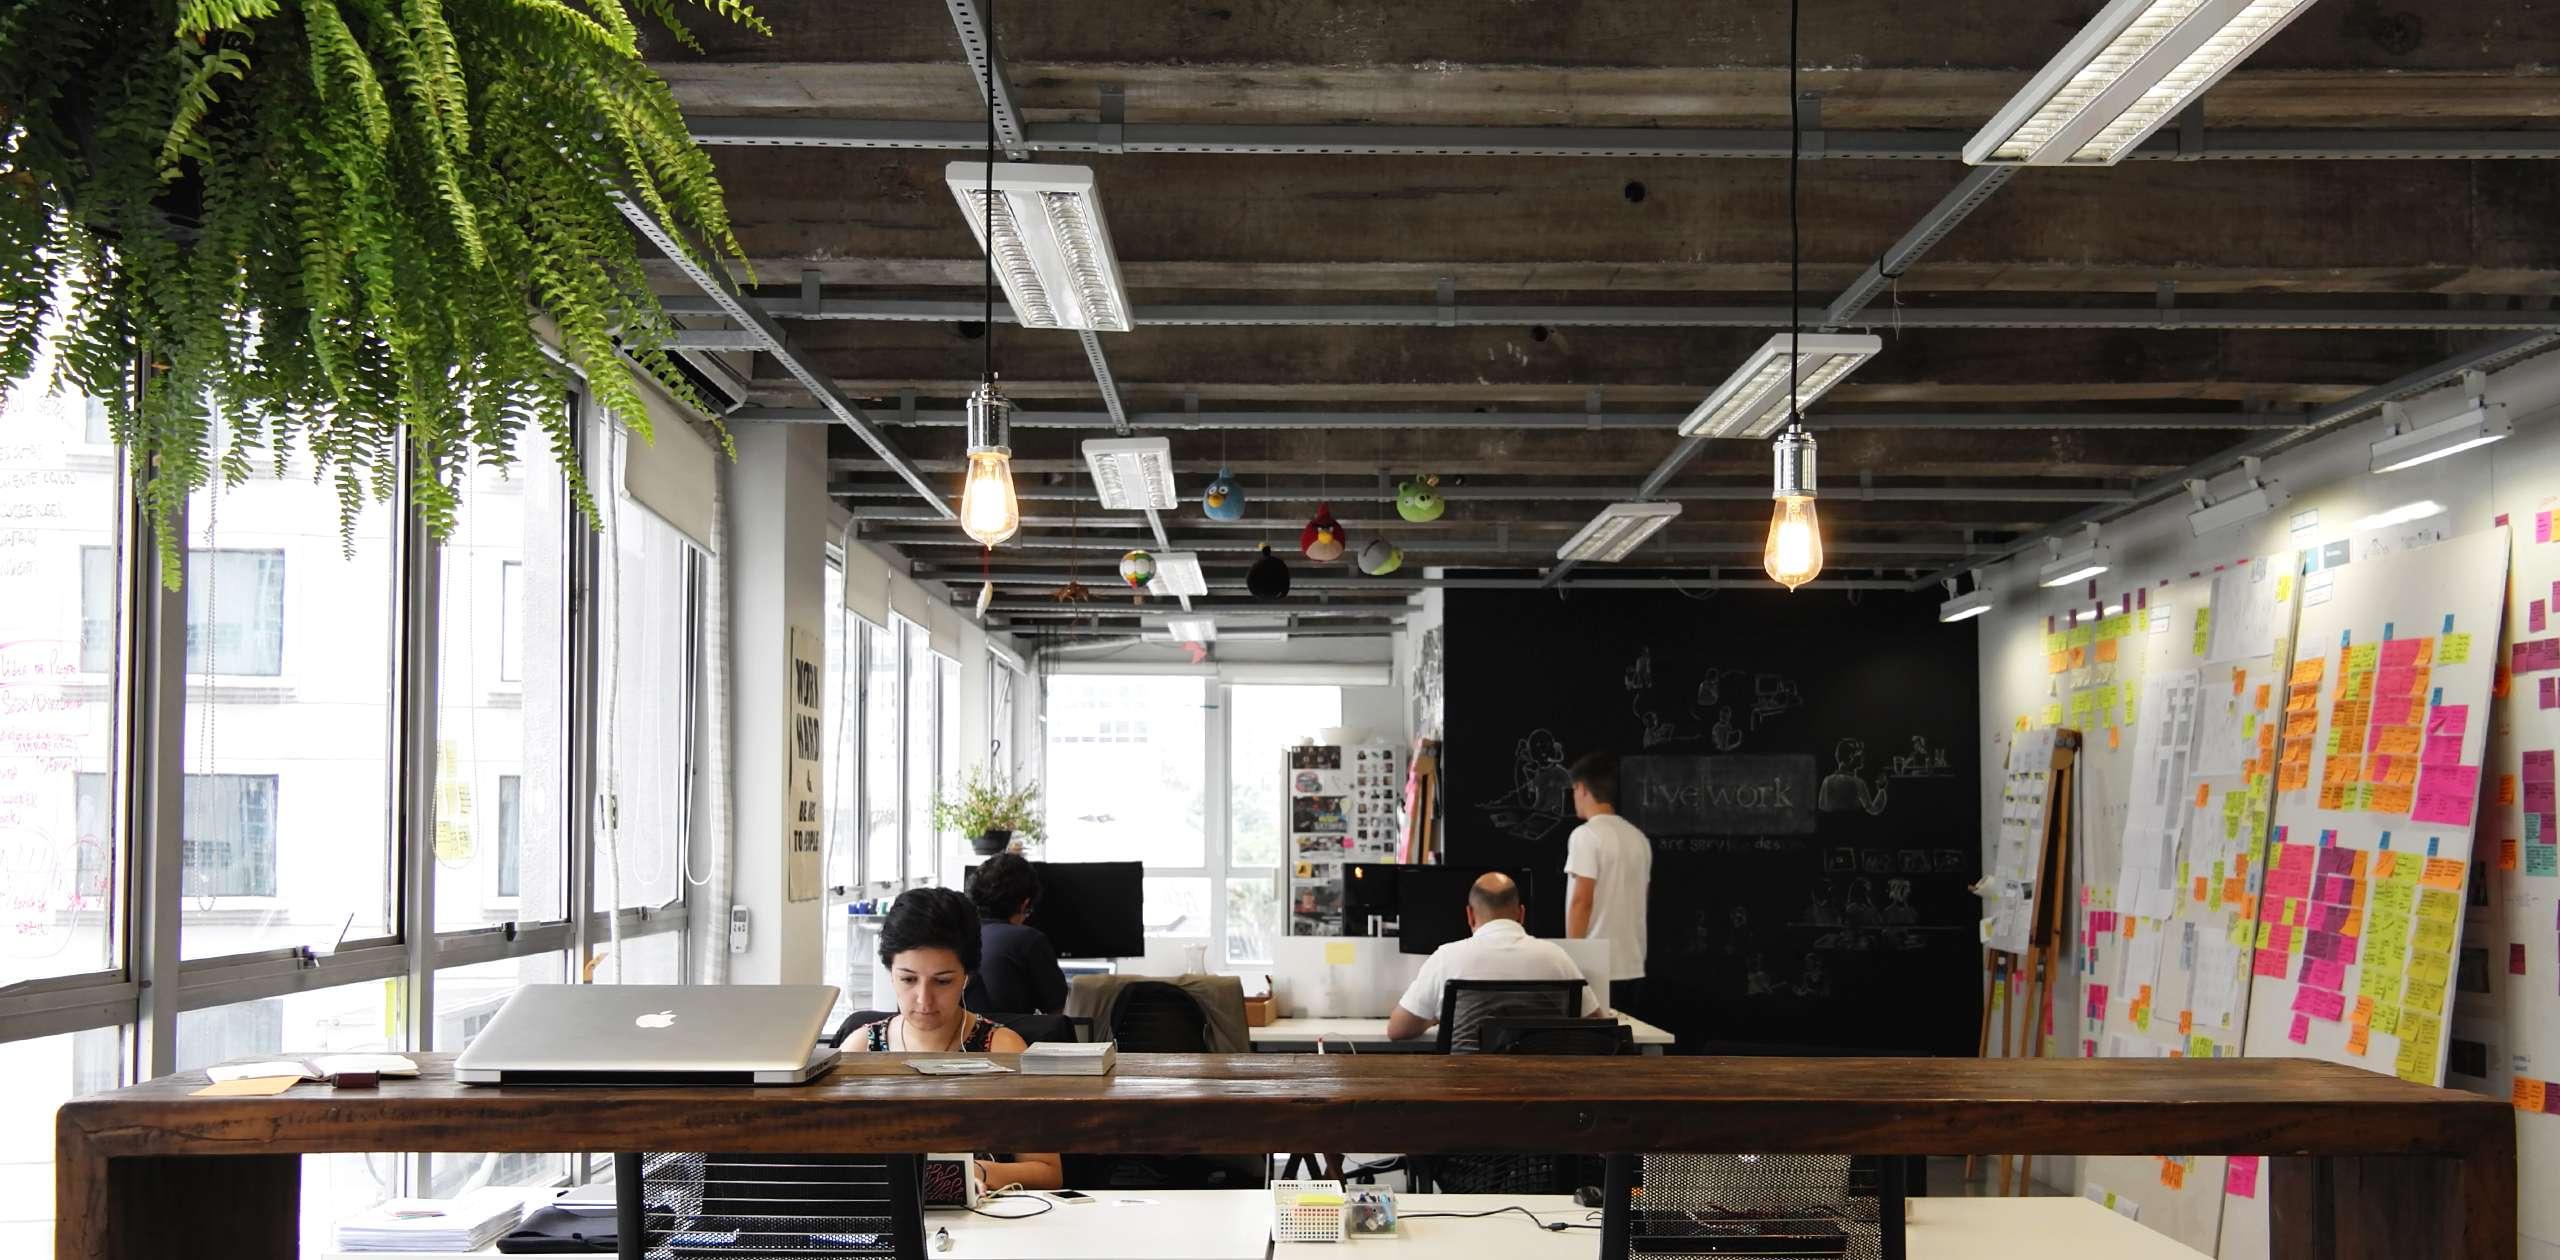 Livework studio<br/> São Paulo